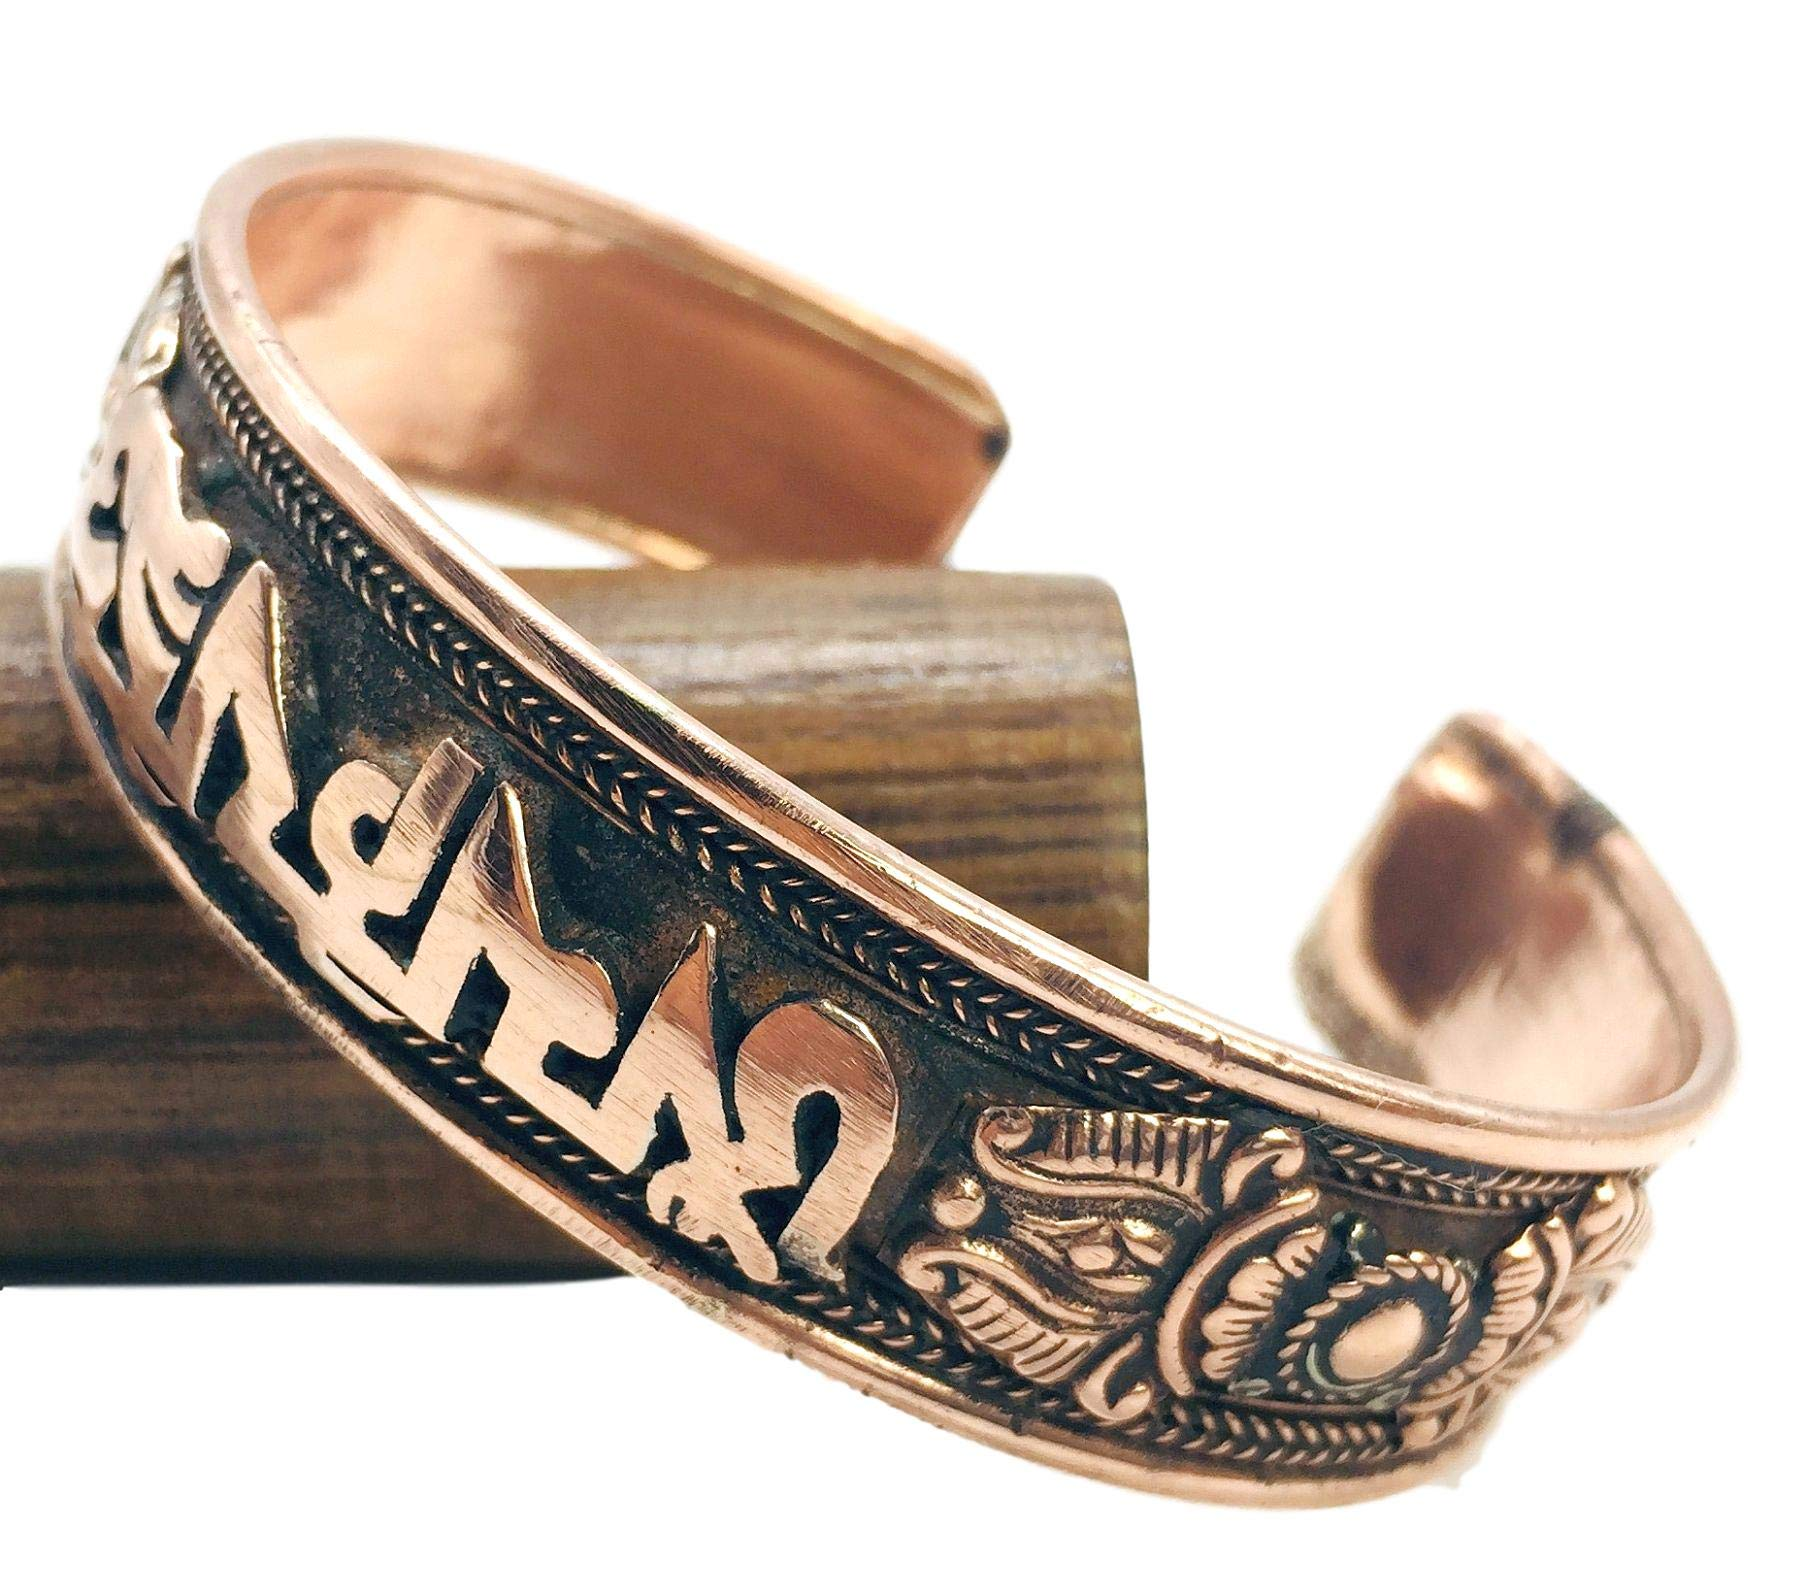 100% Pure Copper Tibetan Healing Bracelet. Unisex, Hand Made High Gauge Copper (Mantra) by Healing Lama